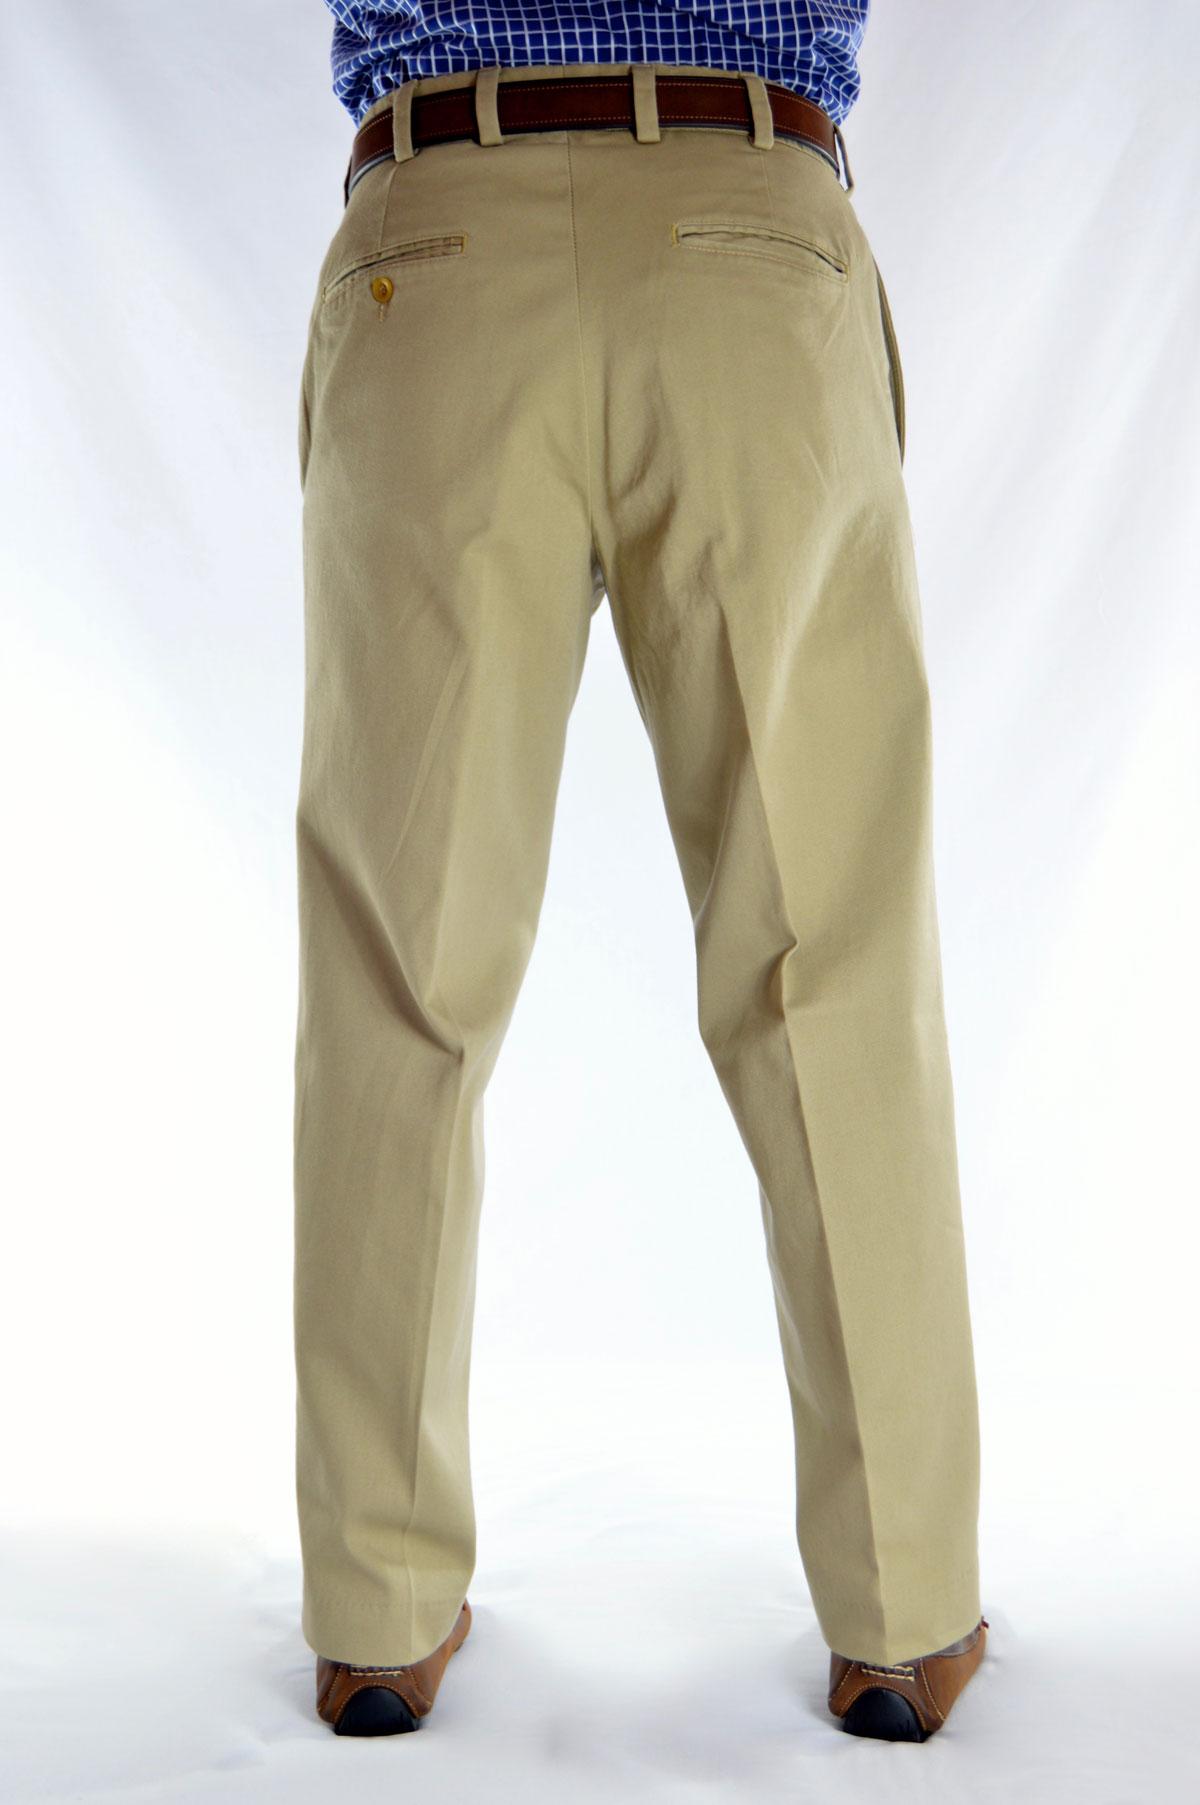 79: 8.5 oz Cramerton Twill Pants